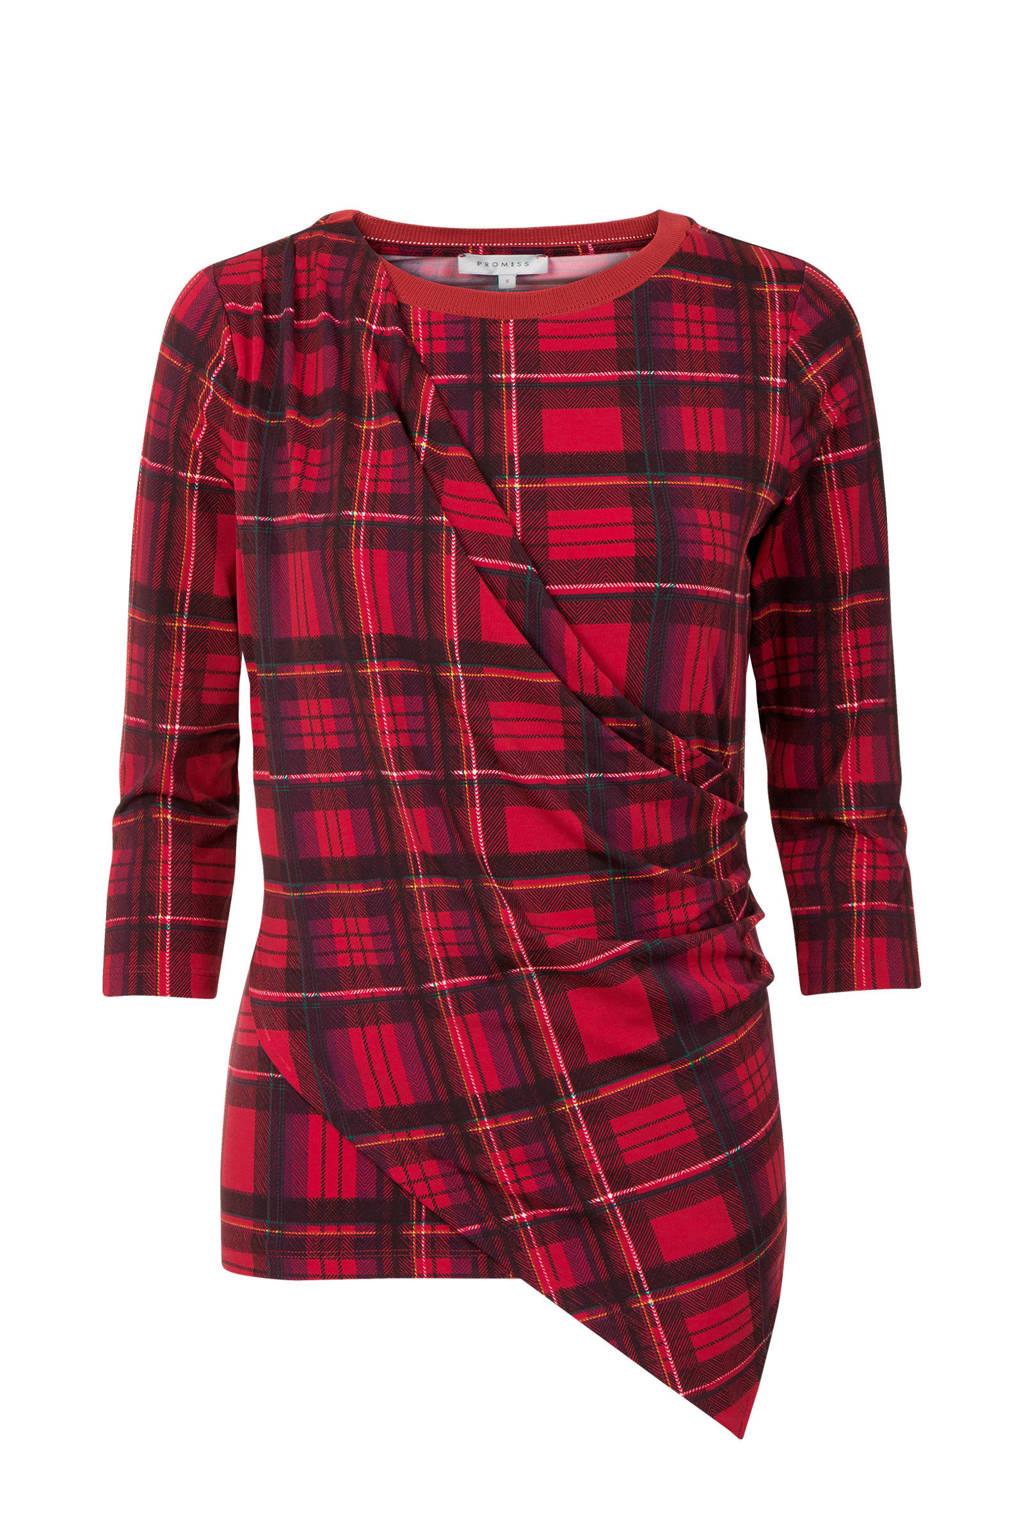 Promiss T-shirt met all over ruit print rood, Rood/zwart